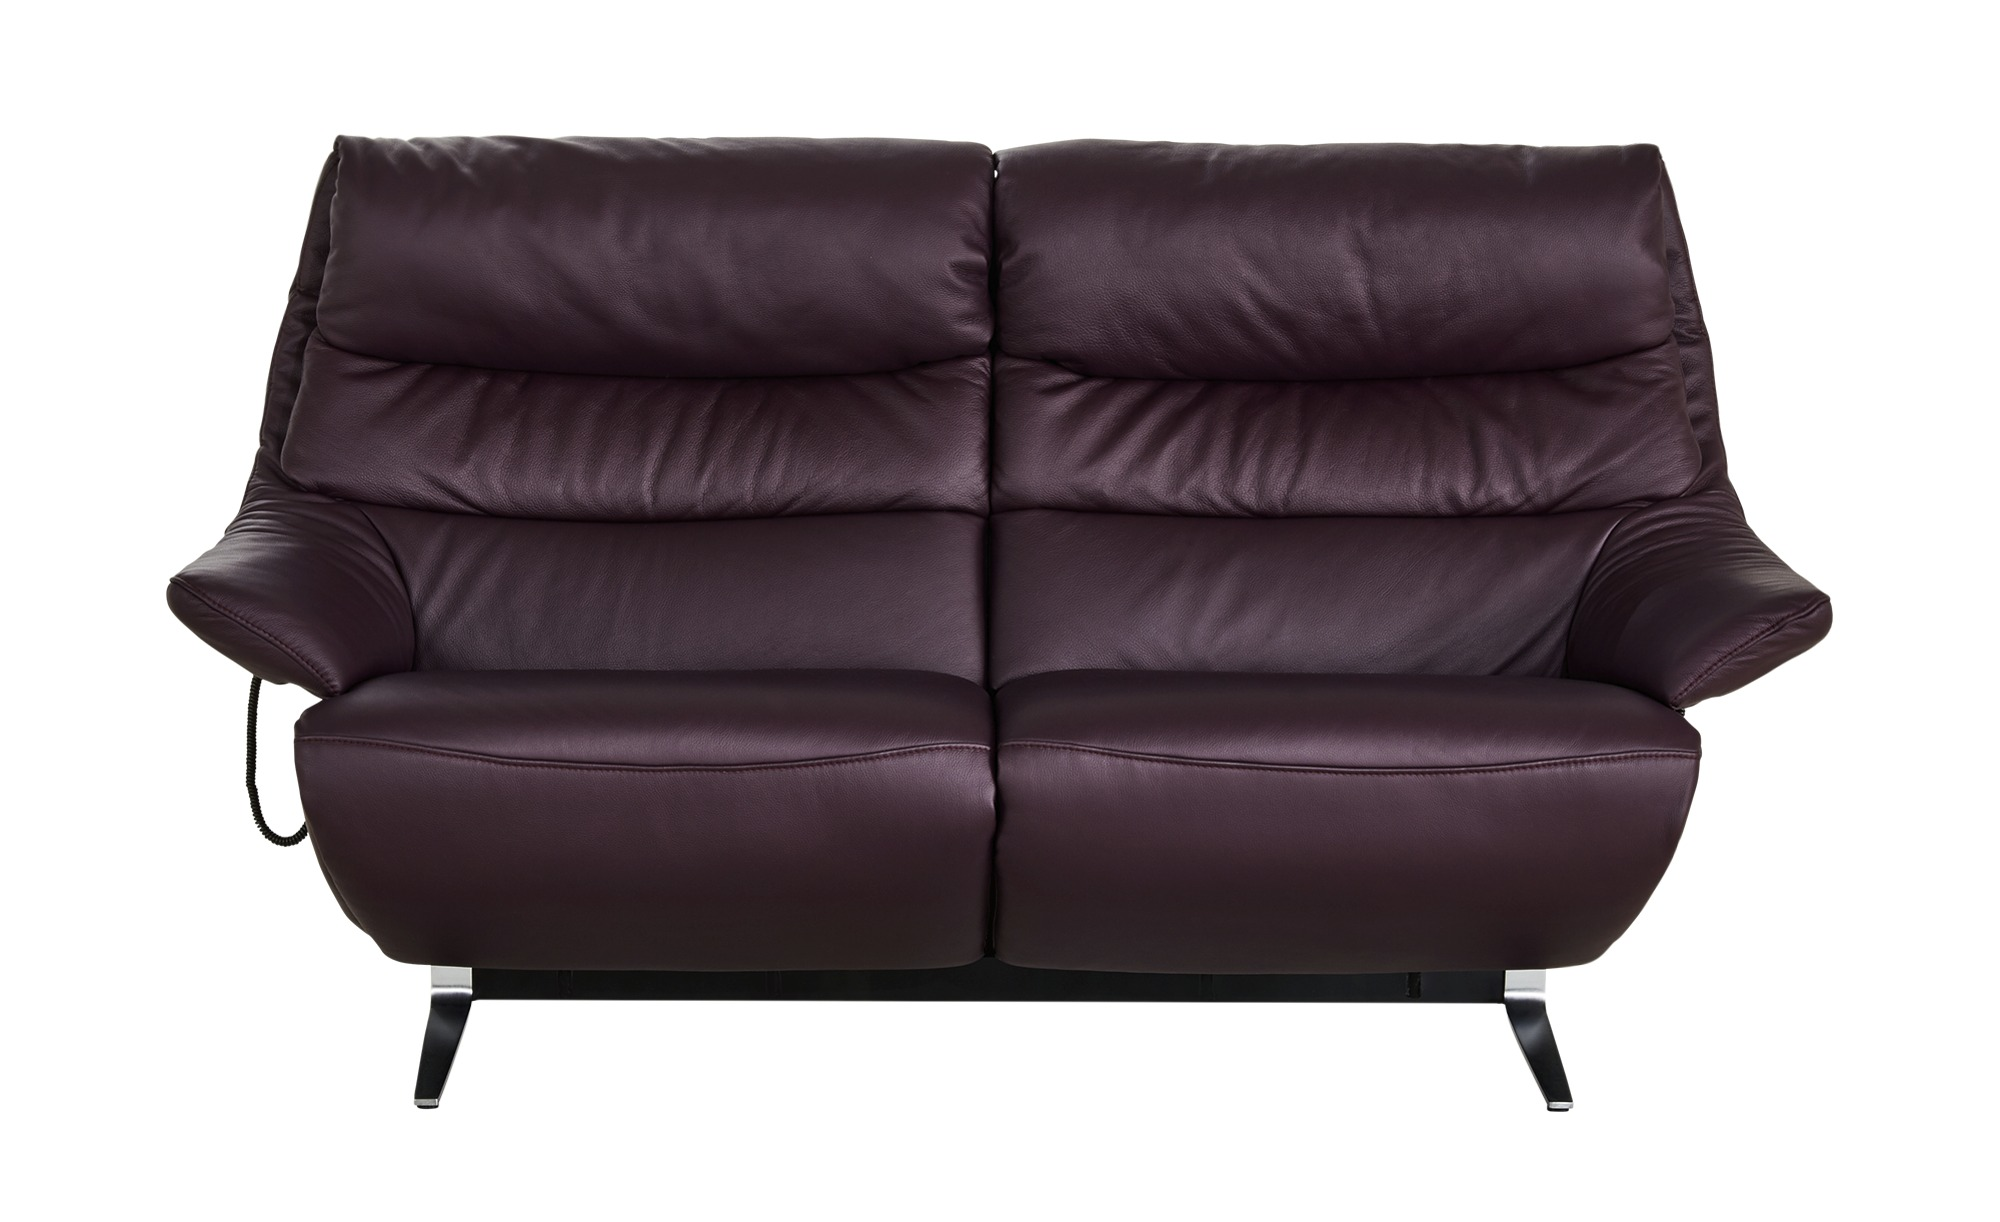 Ledersofa 2,5-sitzig  Salloa ¦ lila/violett ¦ Maße (cm): B: 189 H: 107 T: 92 Polstermöbel > Sofas > Einzelsofas - Höffner